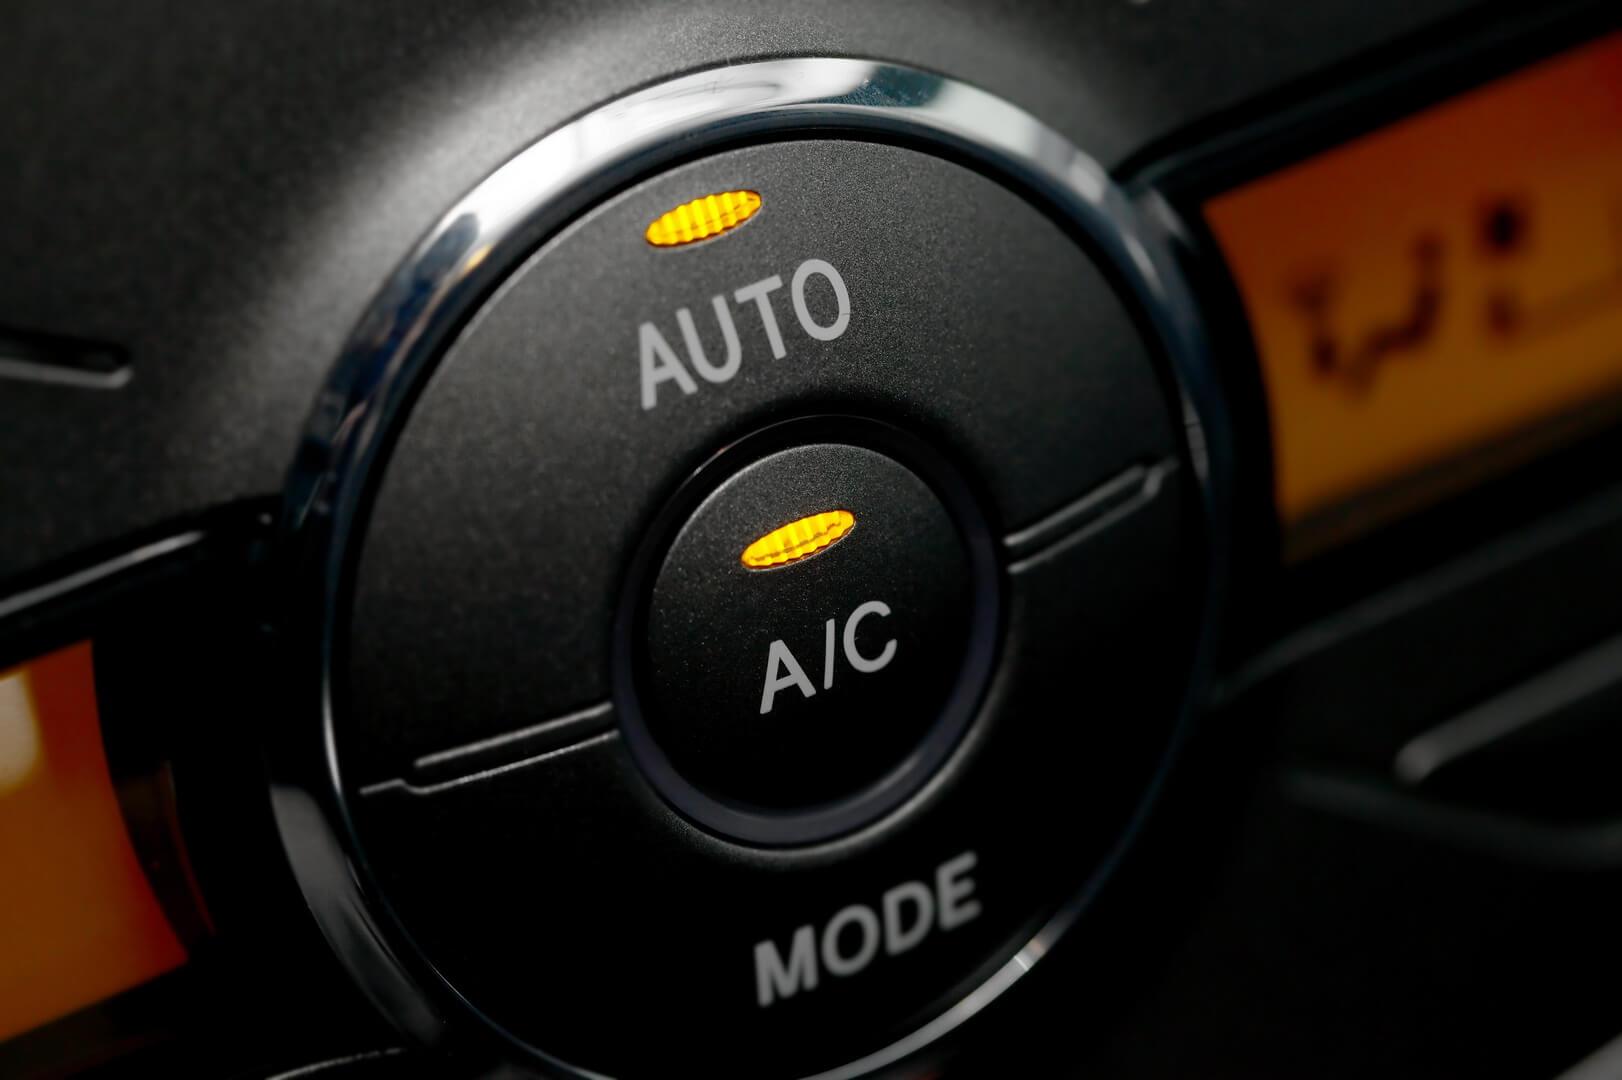 Кнопки включения кондиционера